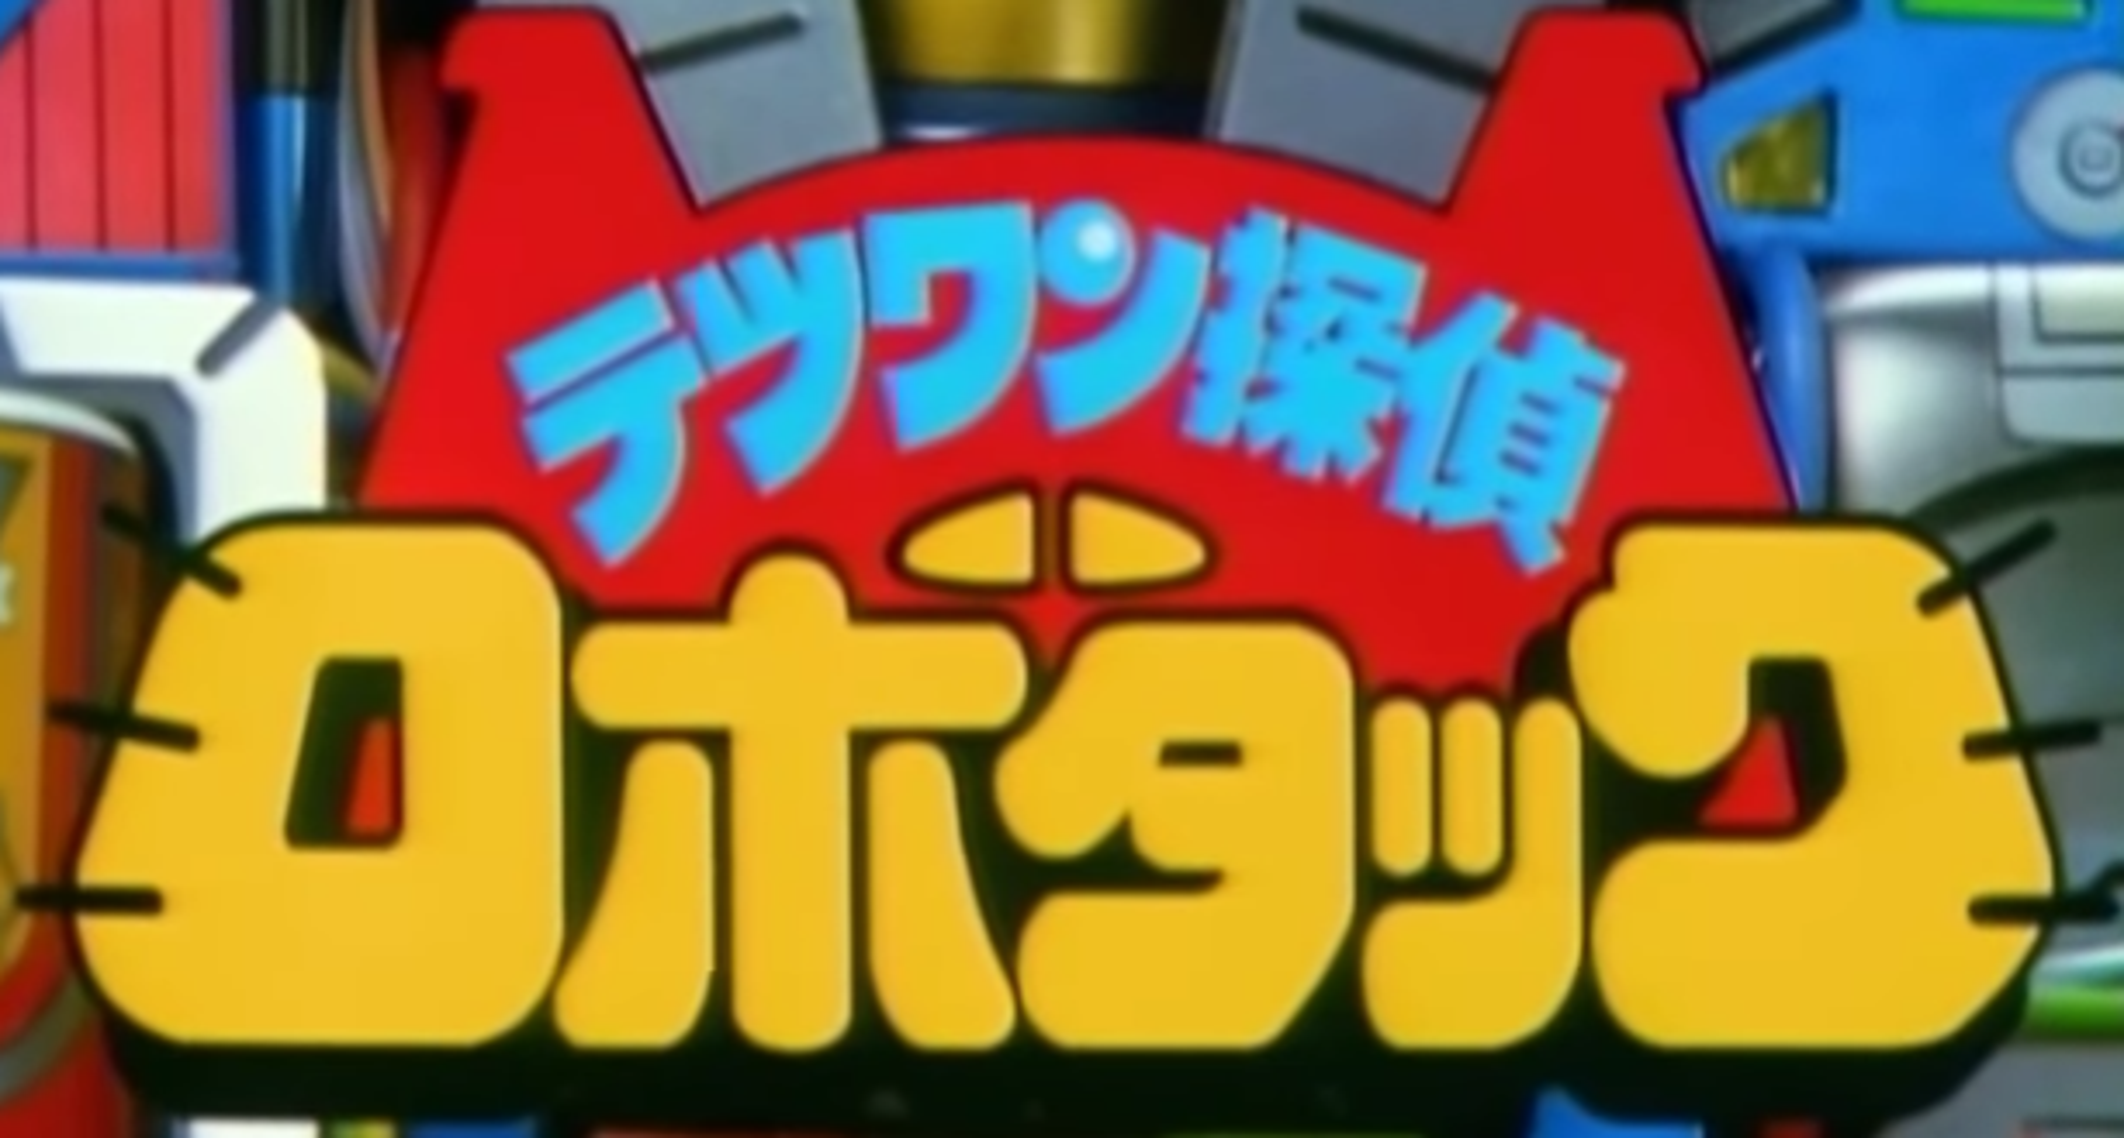 Robotack logo